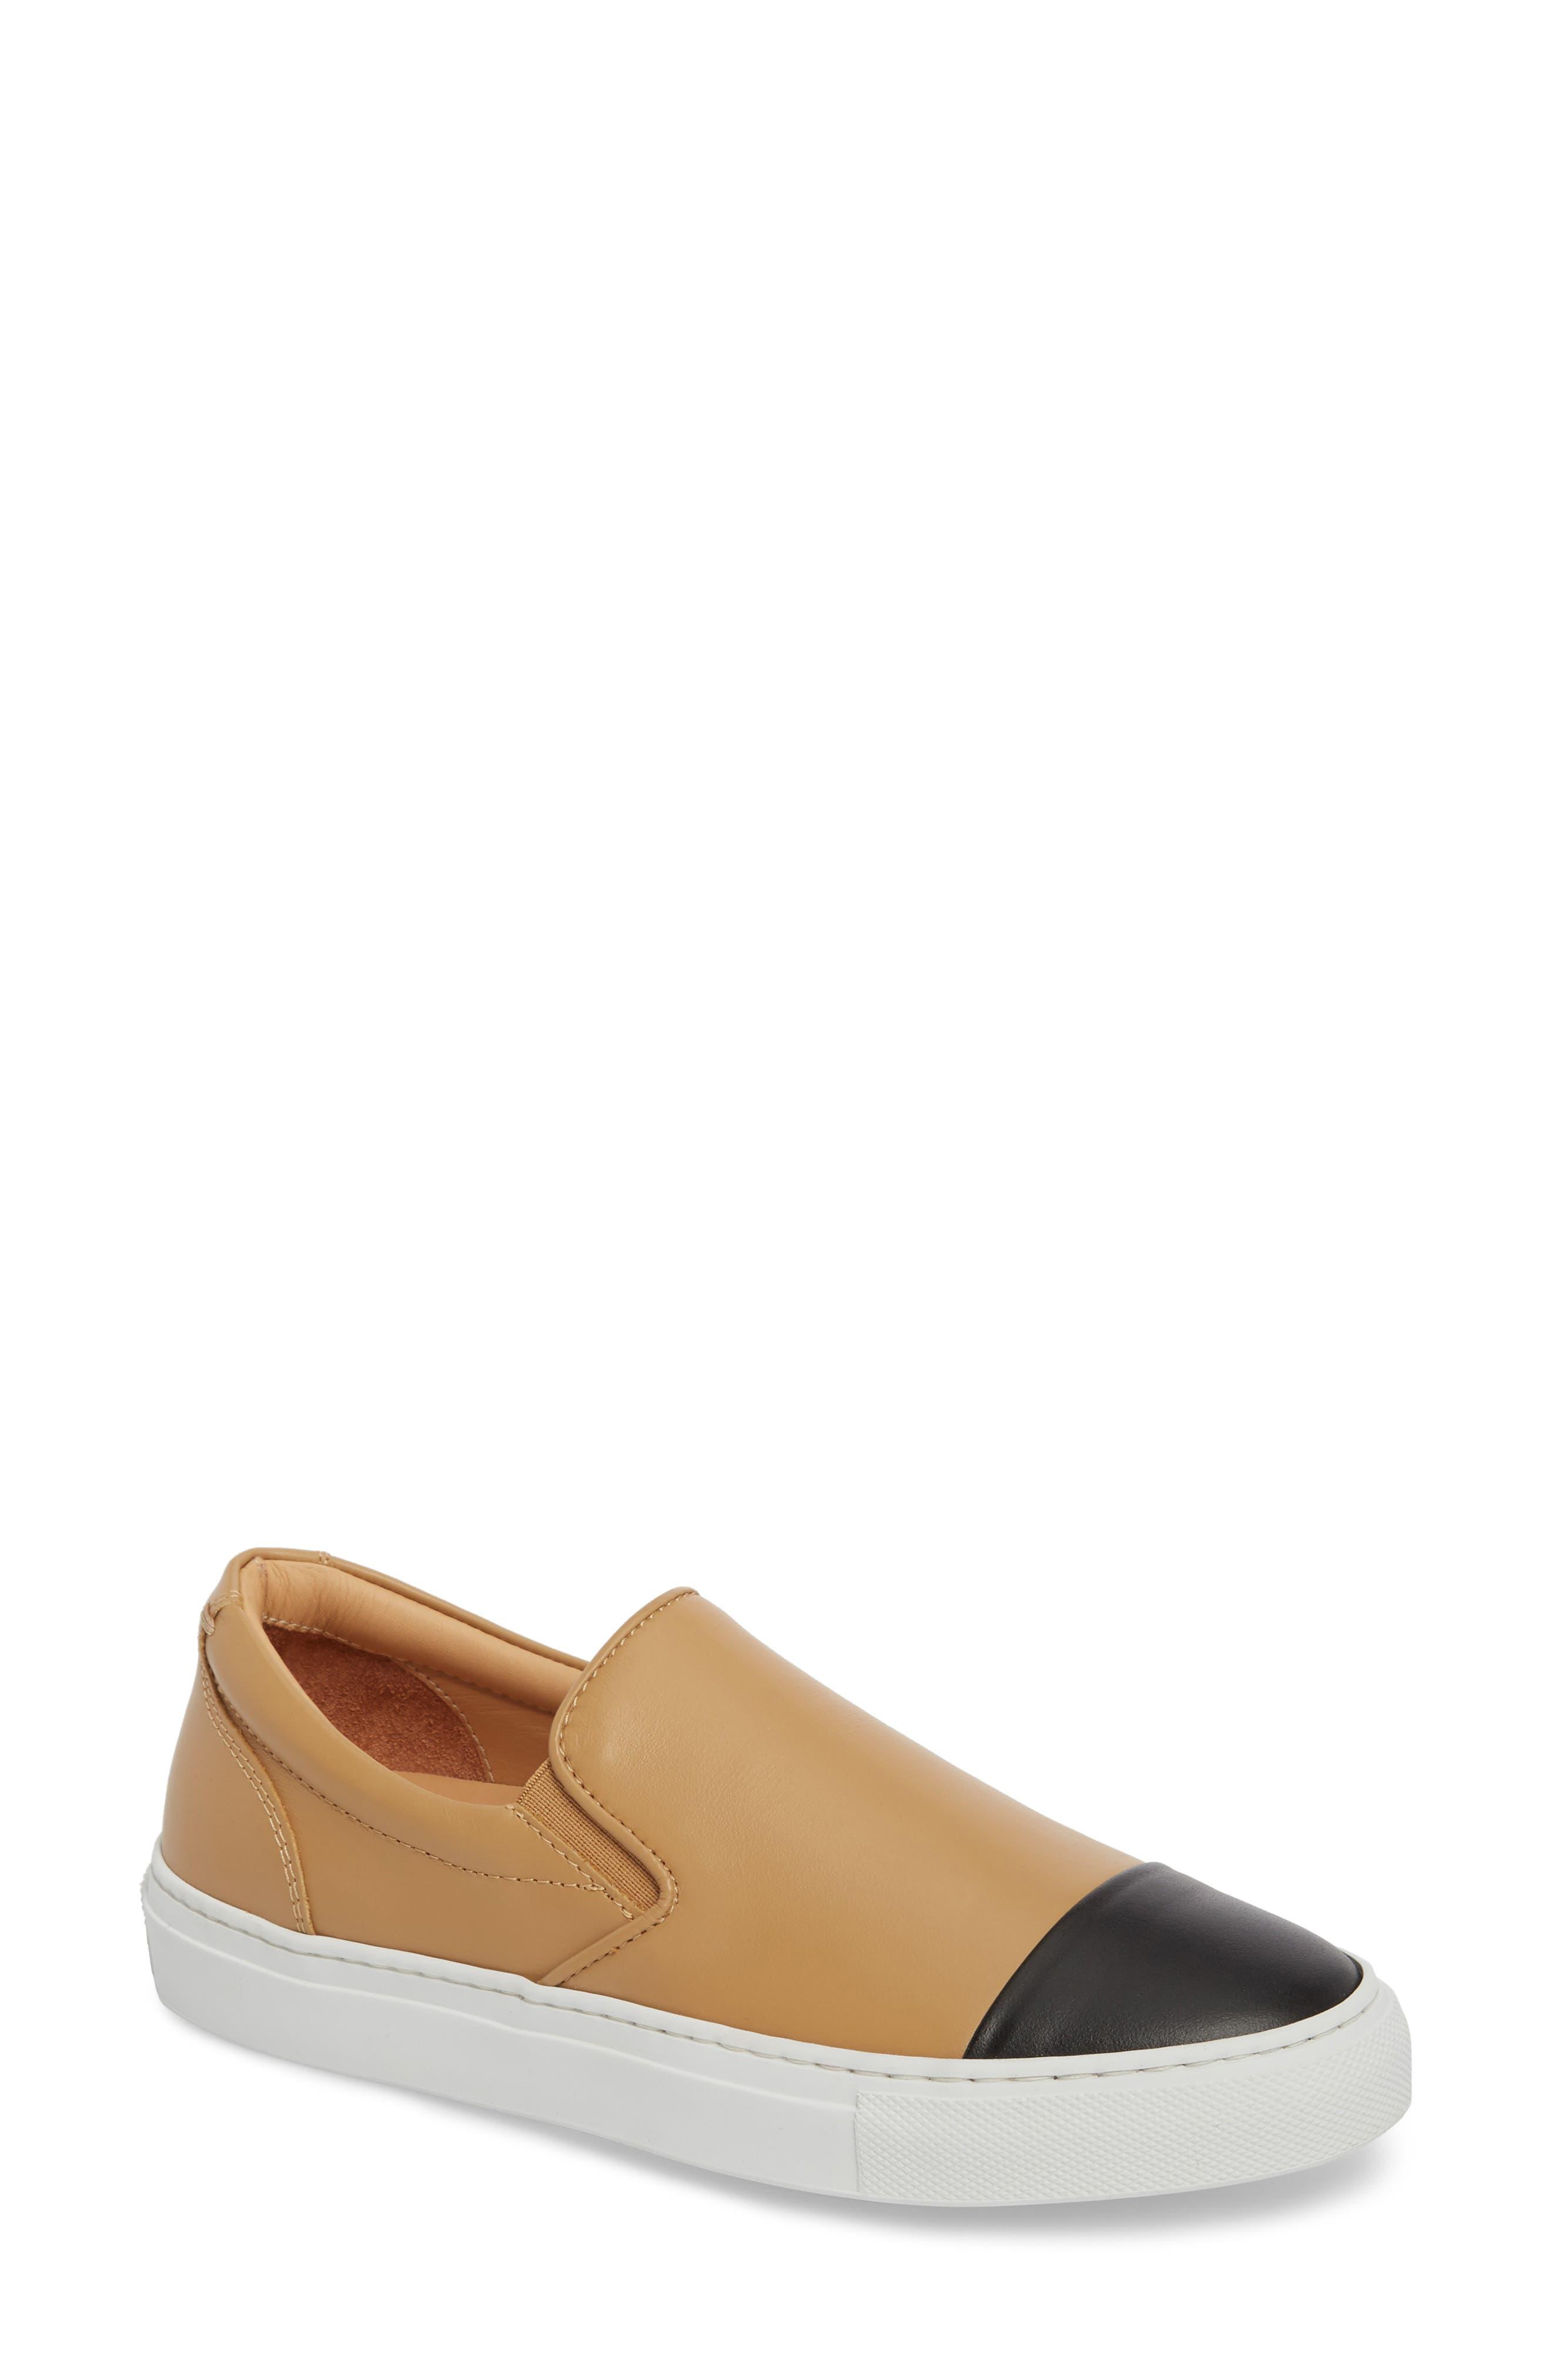 Wooster Cap Toe Slip-On Sneaker,                             Main thumbnail 1, color,                             ALMOND